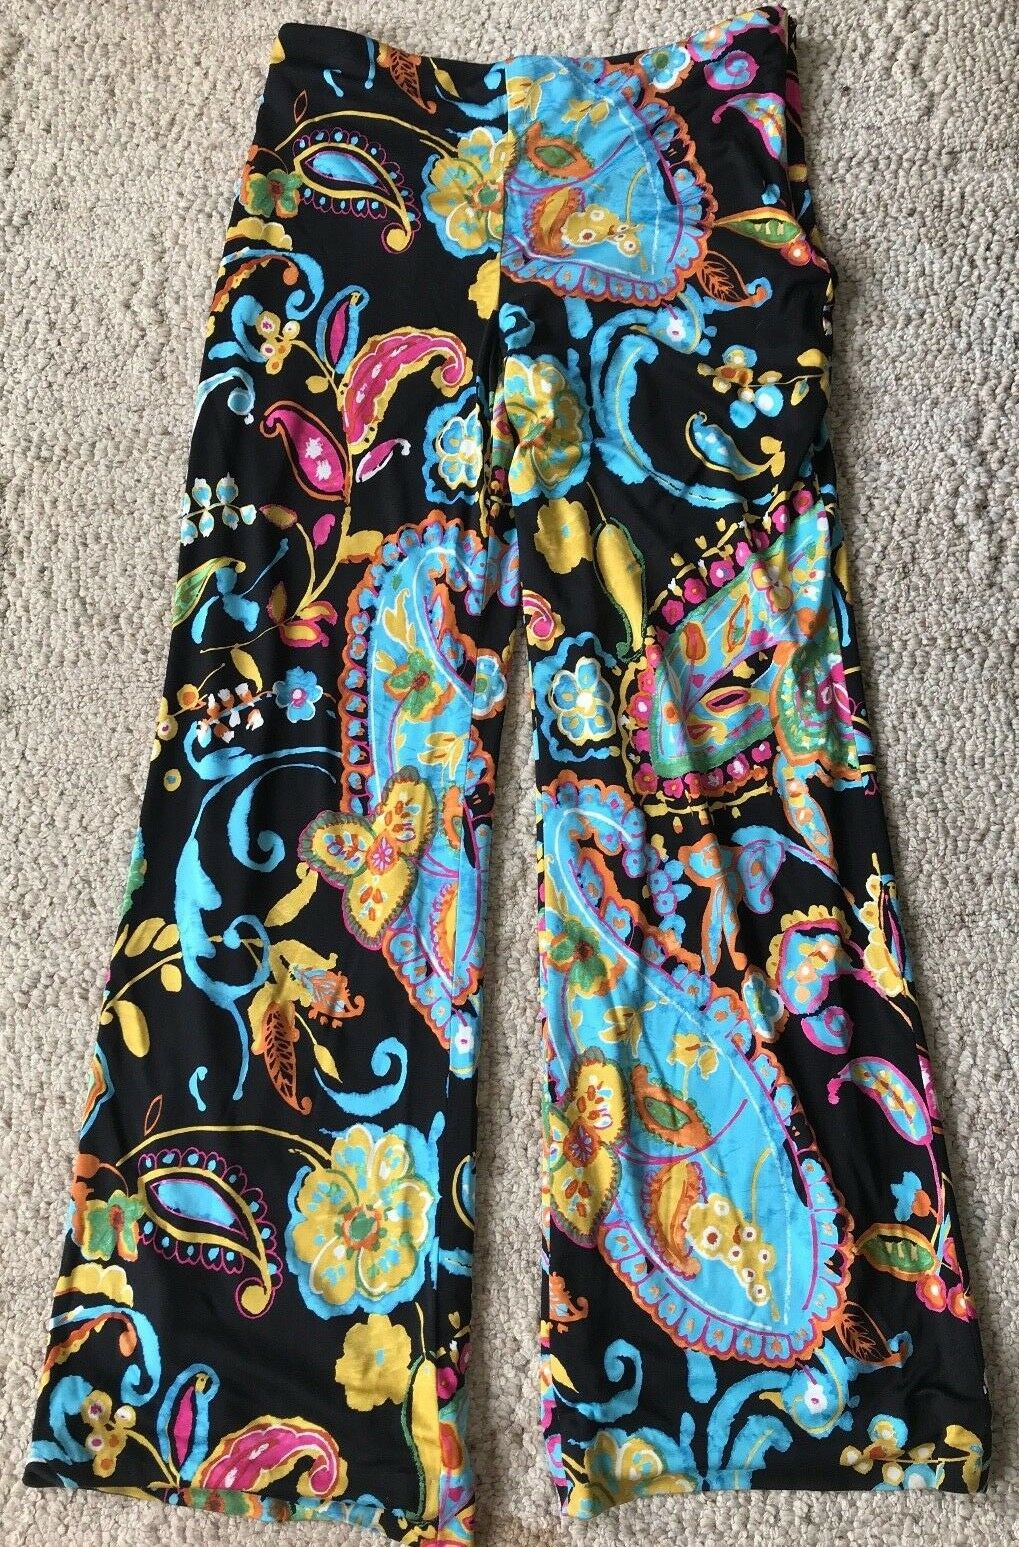 ️Ralph Lauren Silk Paisly Lined Print Pants Sz 10 Stretch Classy Multi Farbe ️